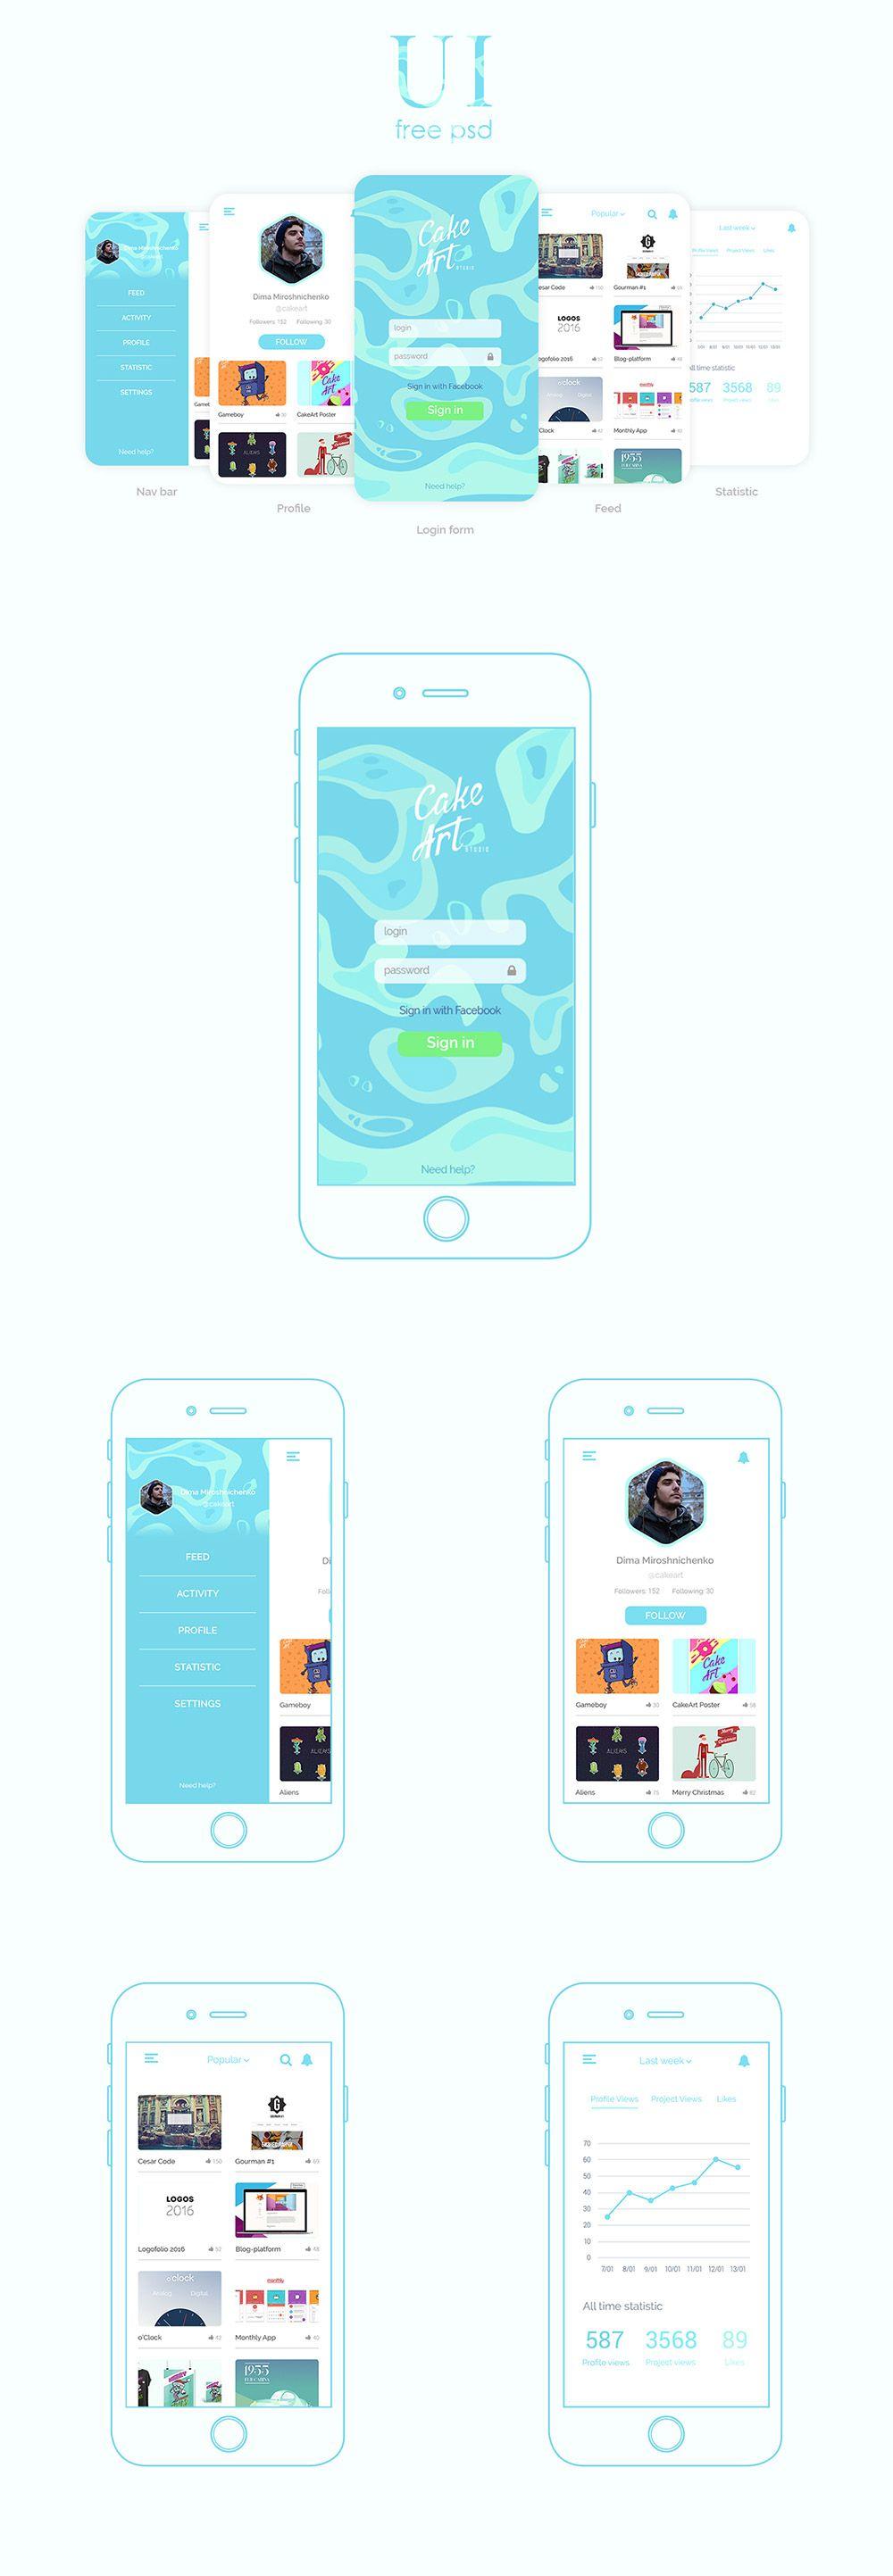 Cool Elegant Social Mobile App Design Templates Free PSD. Download ...